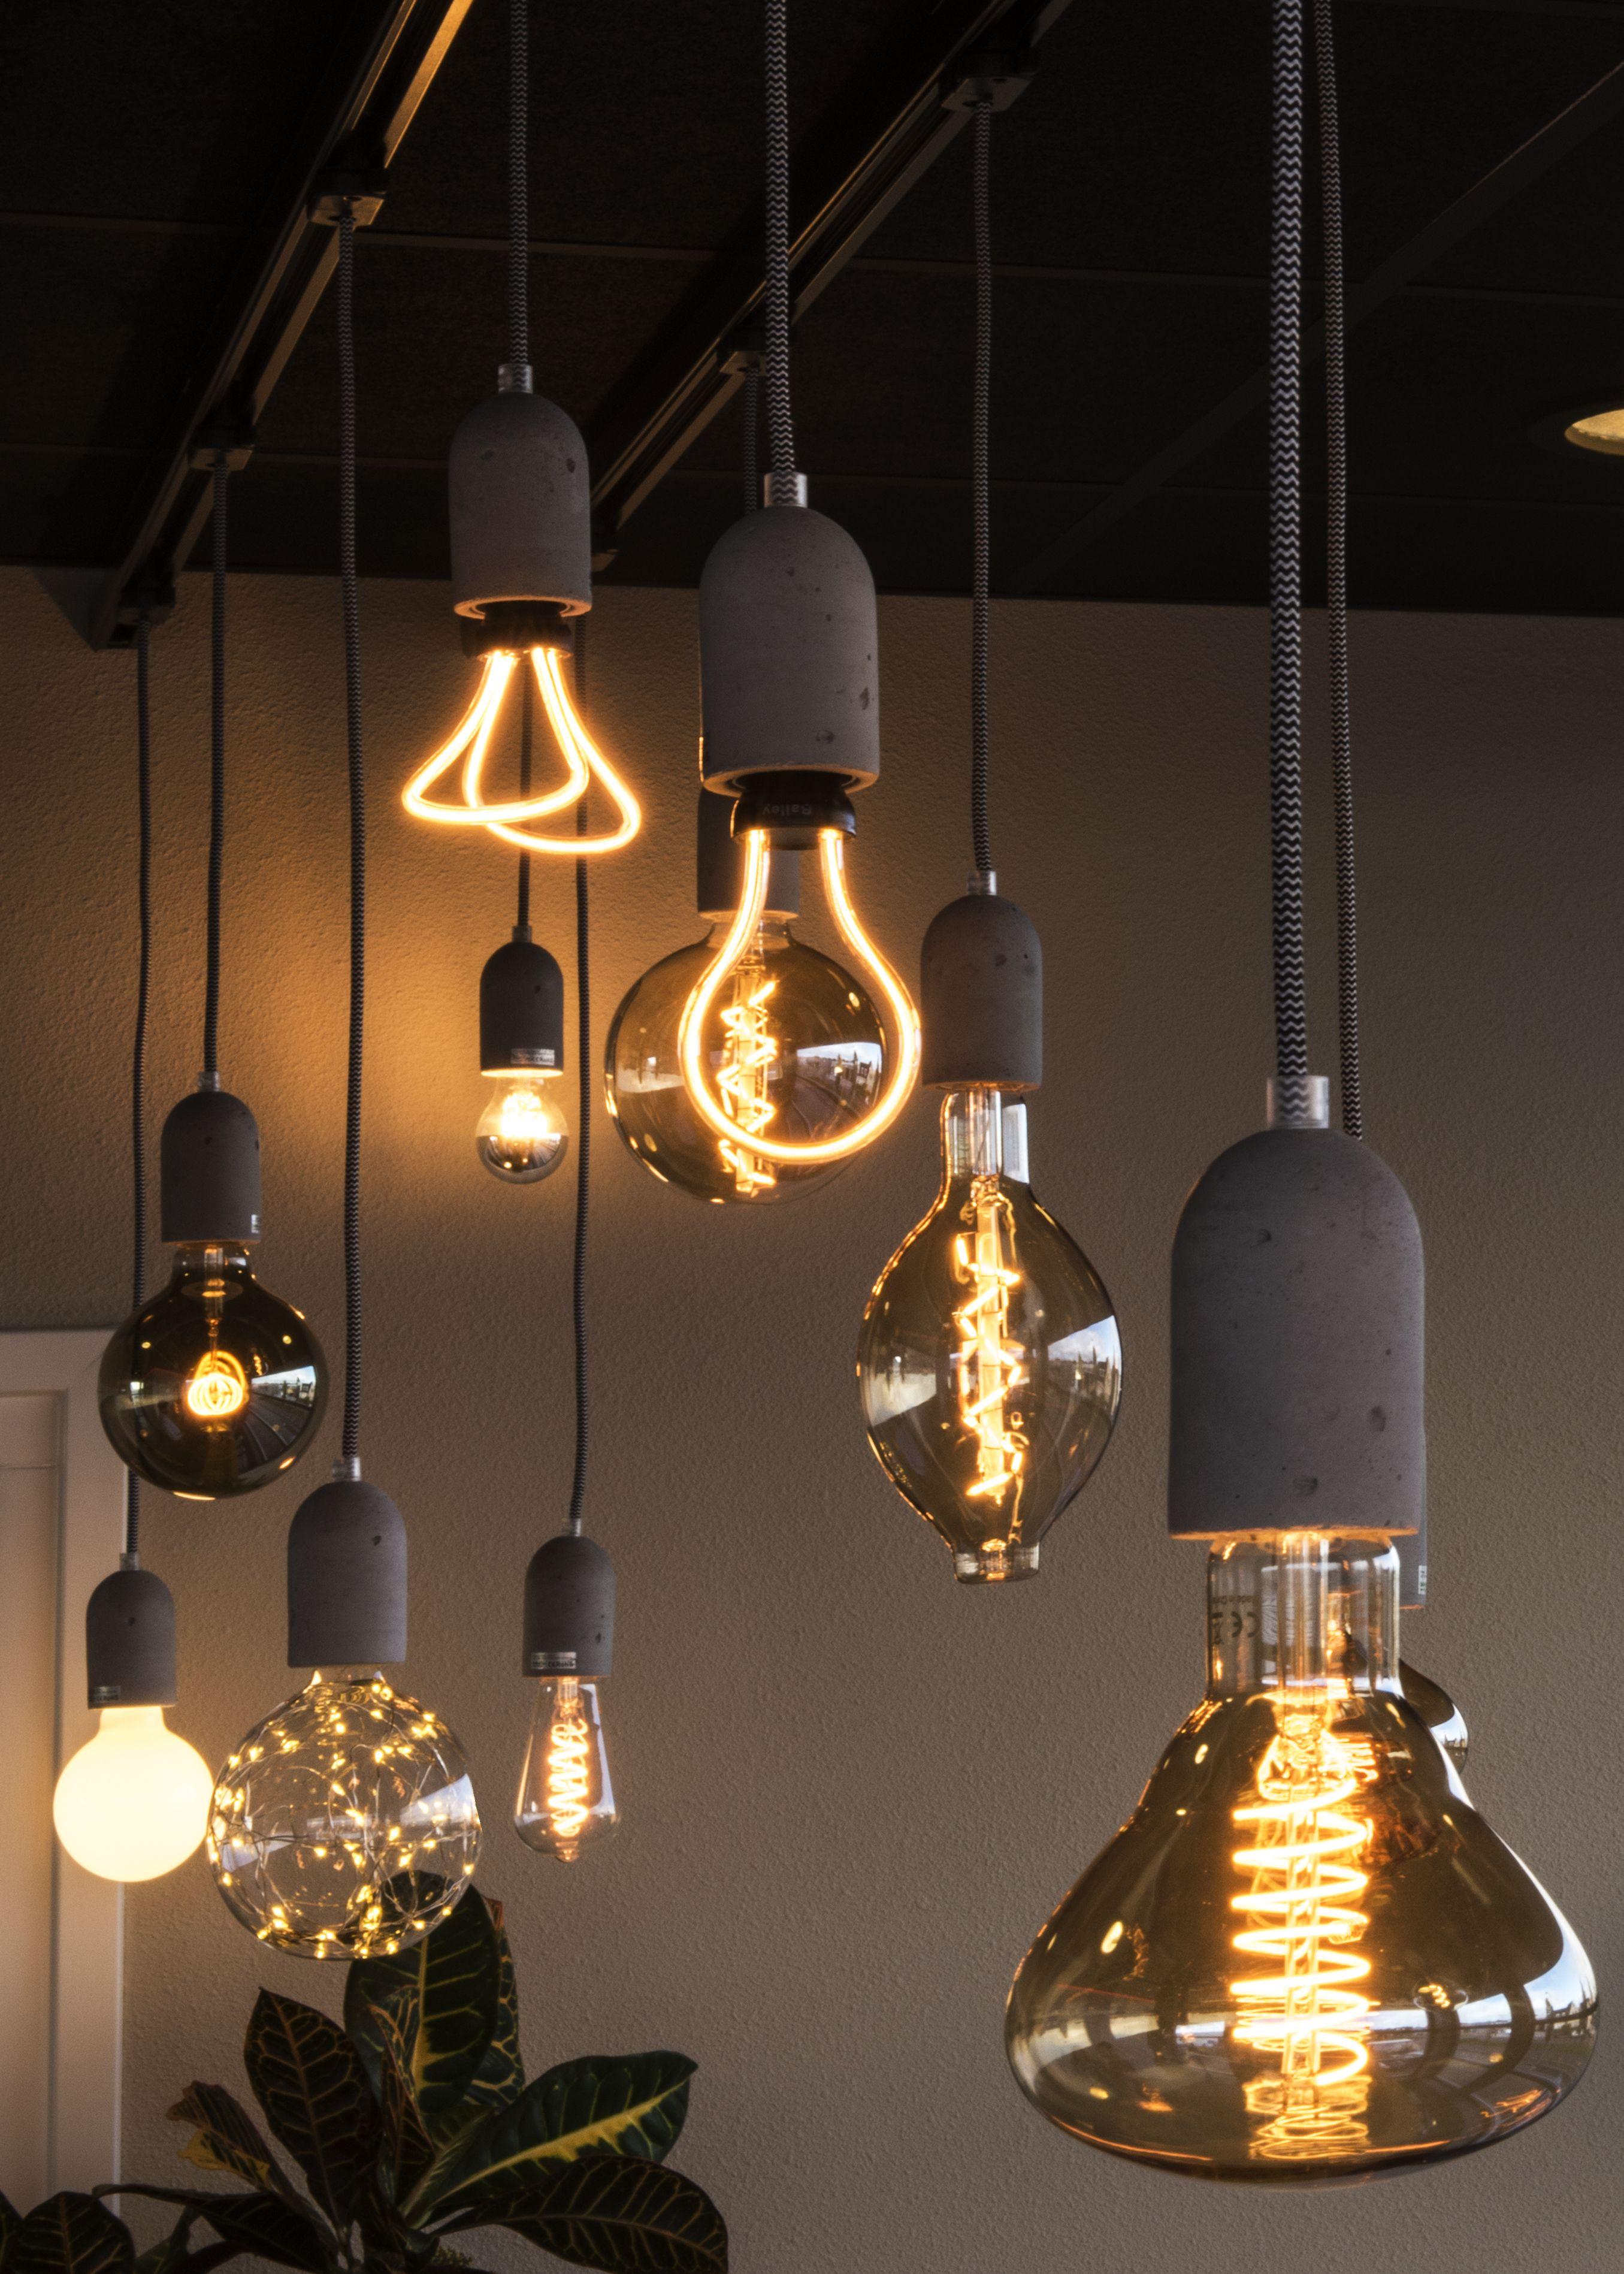 Bailey S Potpourri Of Led Lamps Diy Light Fixtures Home Lighting Lighting Design Interior